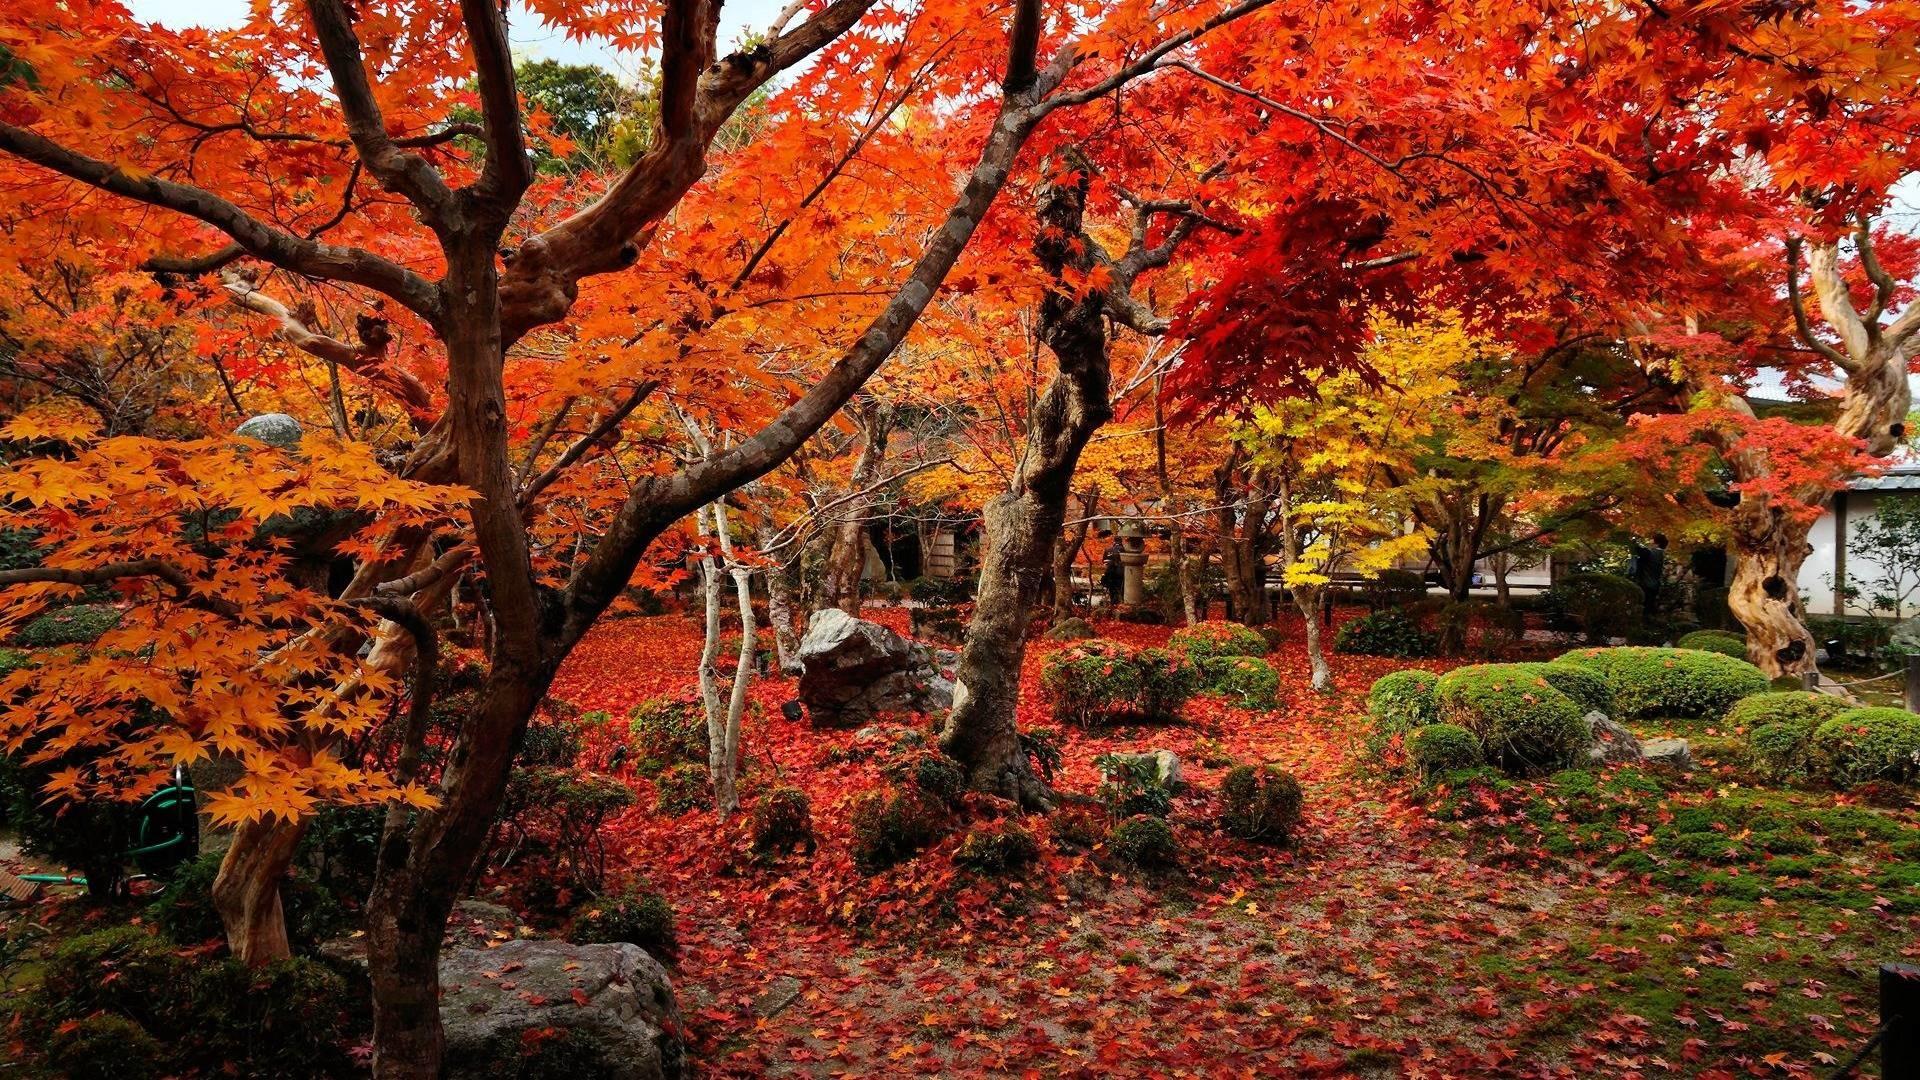 … desktop wallpapersafari; autumn wallpapers wallpaper cave;  free autumn wallpaper backgrounds …